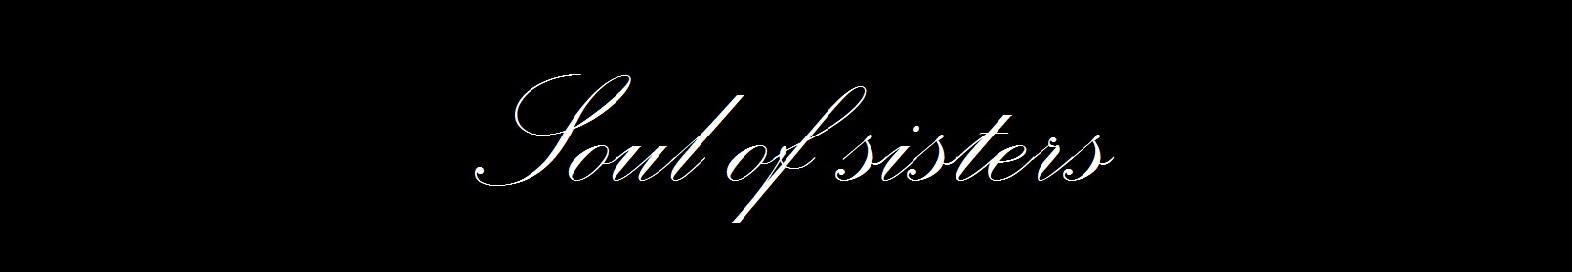 Soul of sisters